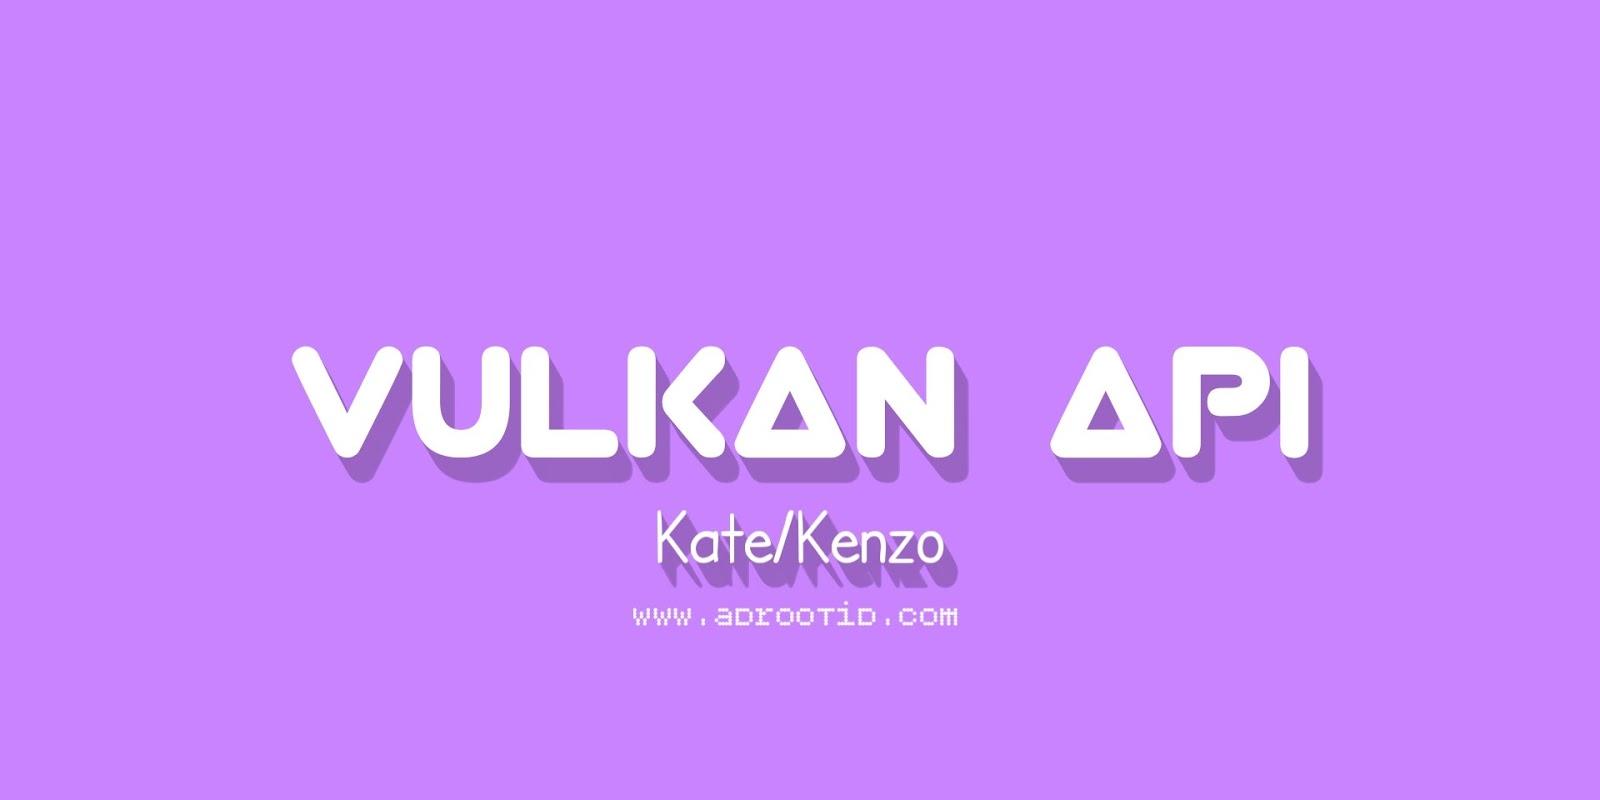 Enable Vulkan API Kate Kenzo